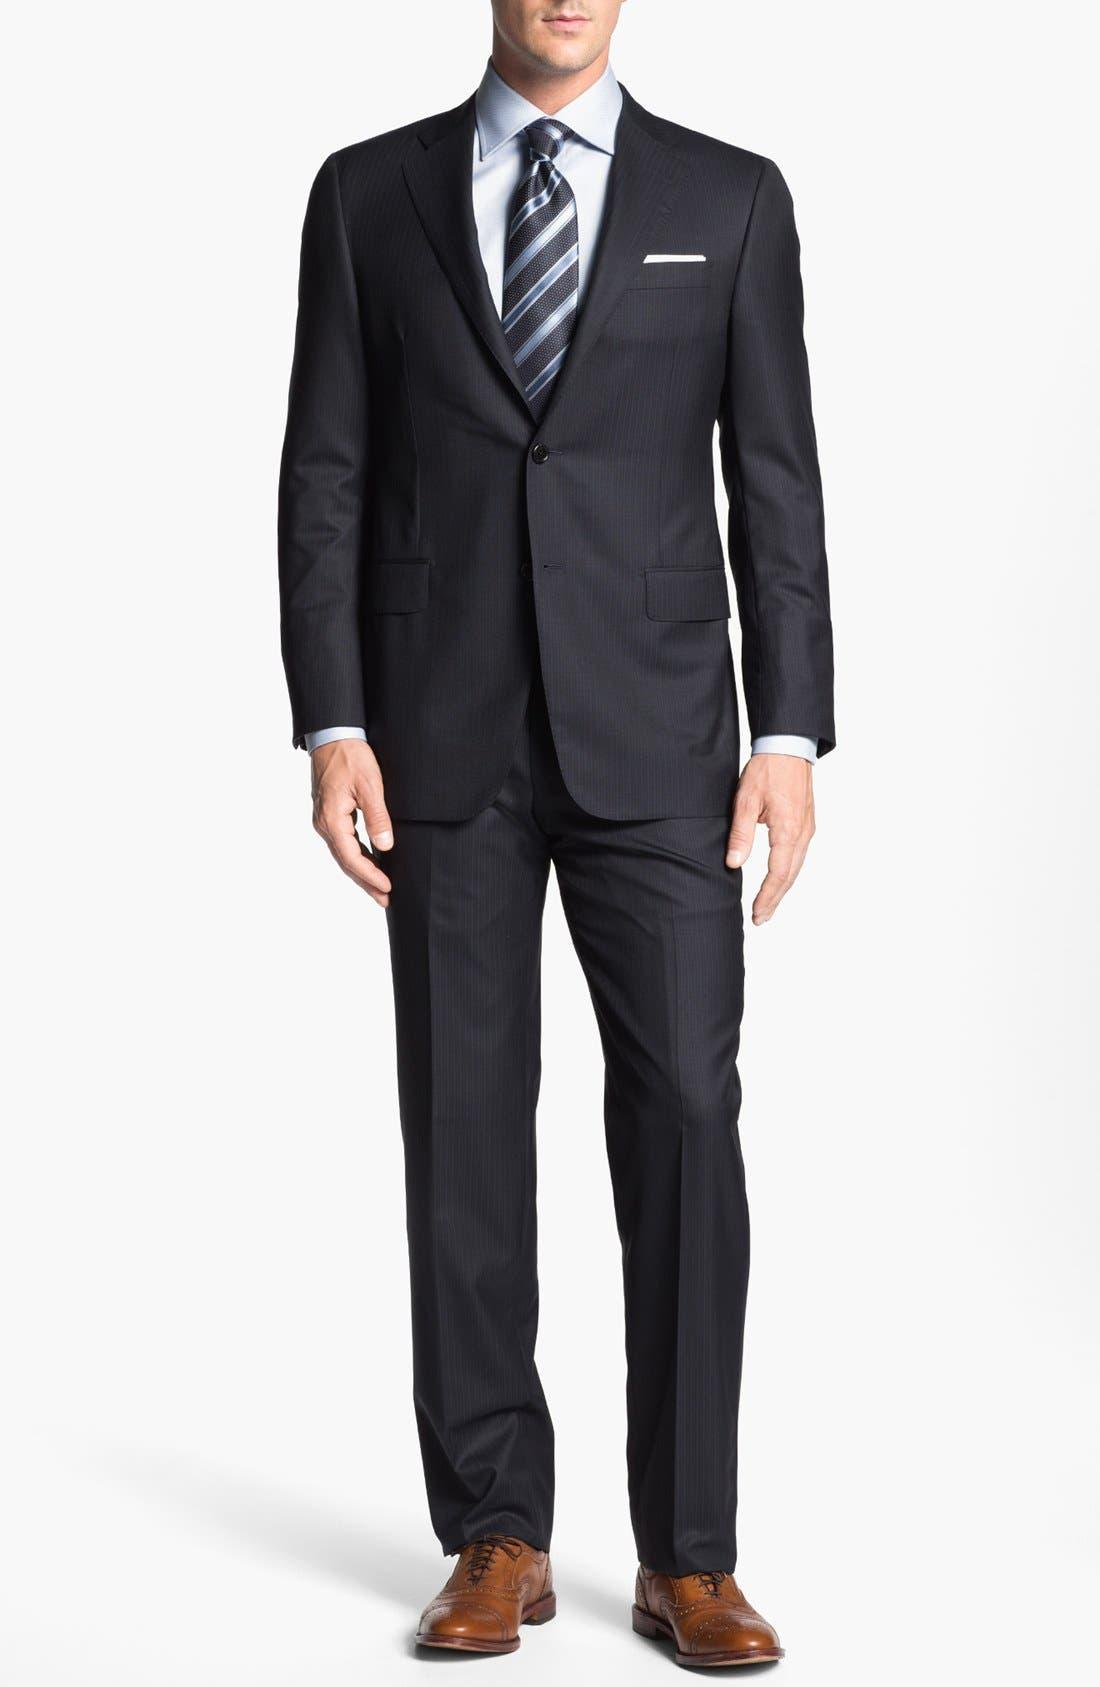 Alternate Image 1 Selected - Hickey Freeman 'Beacon' Stripe Suit